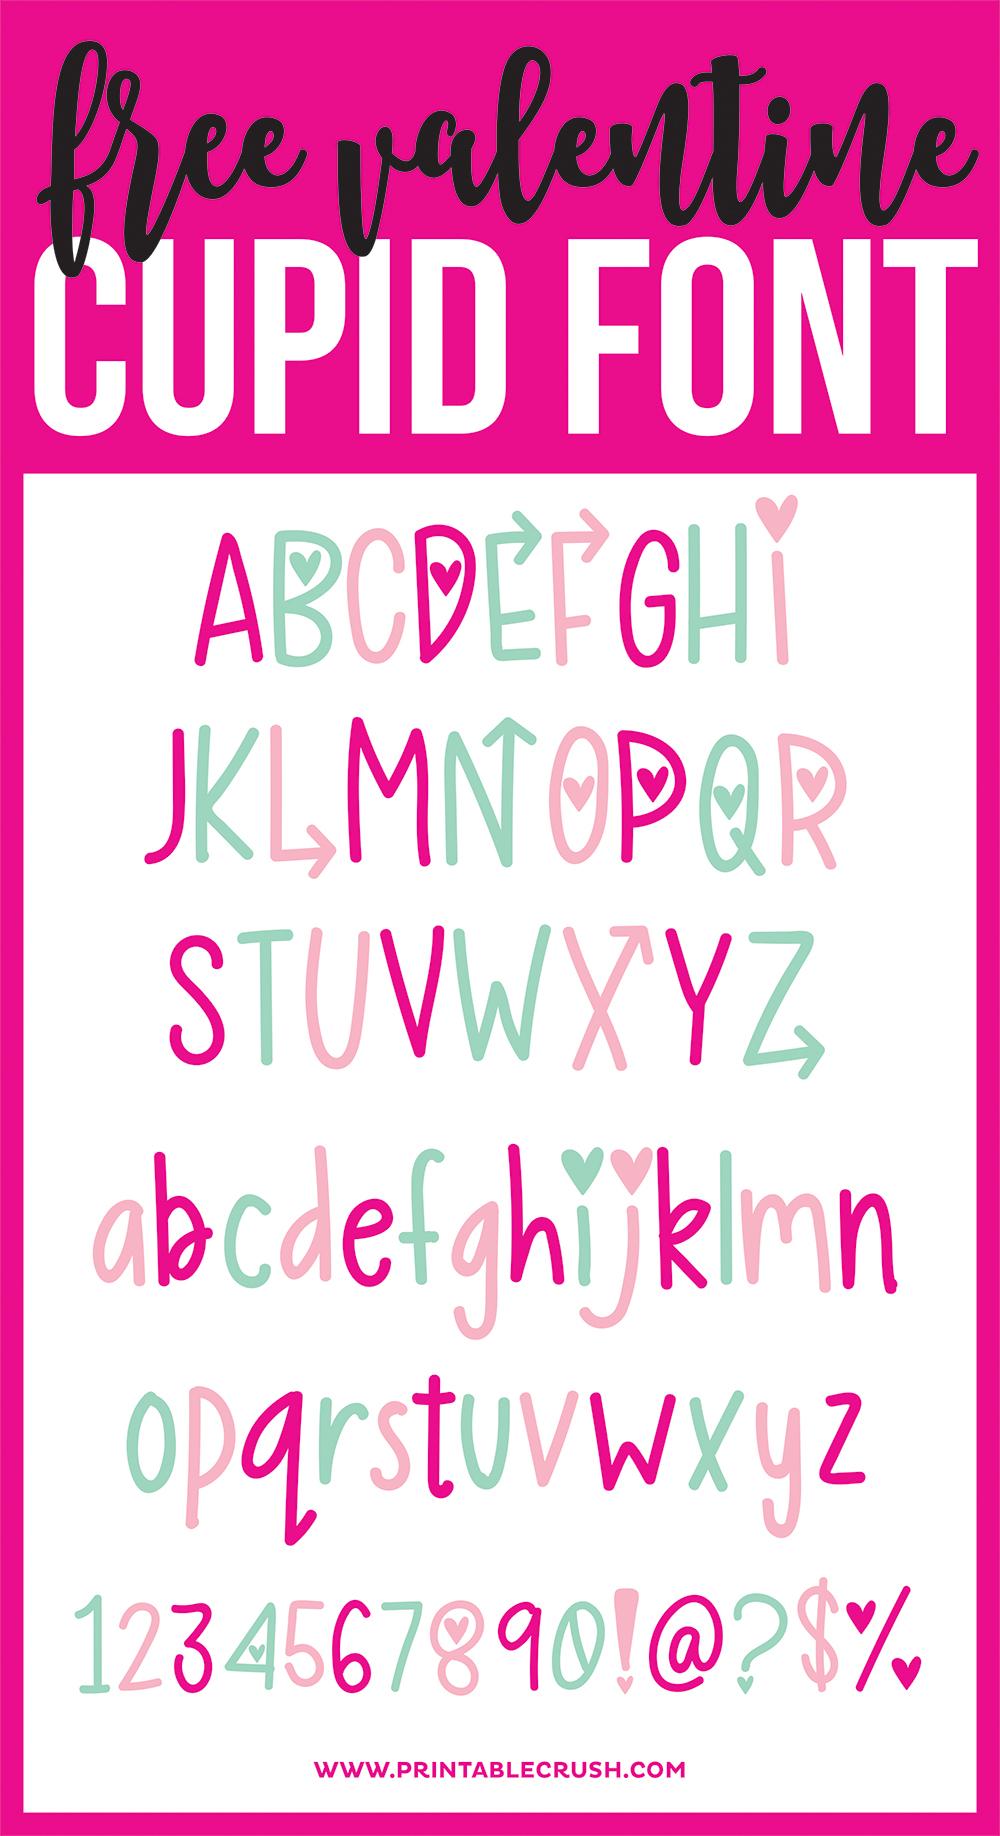 www.printablecrush.comfree valentinecupid Font